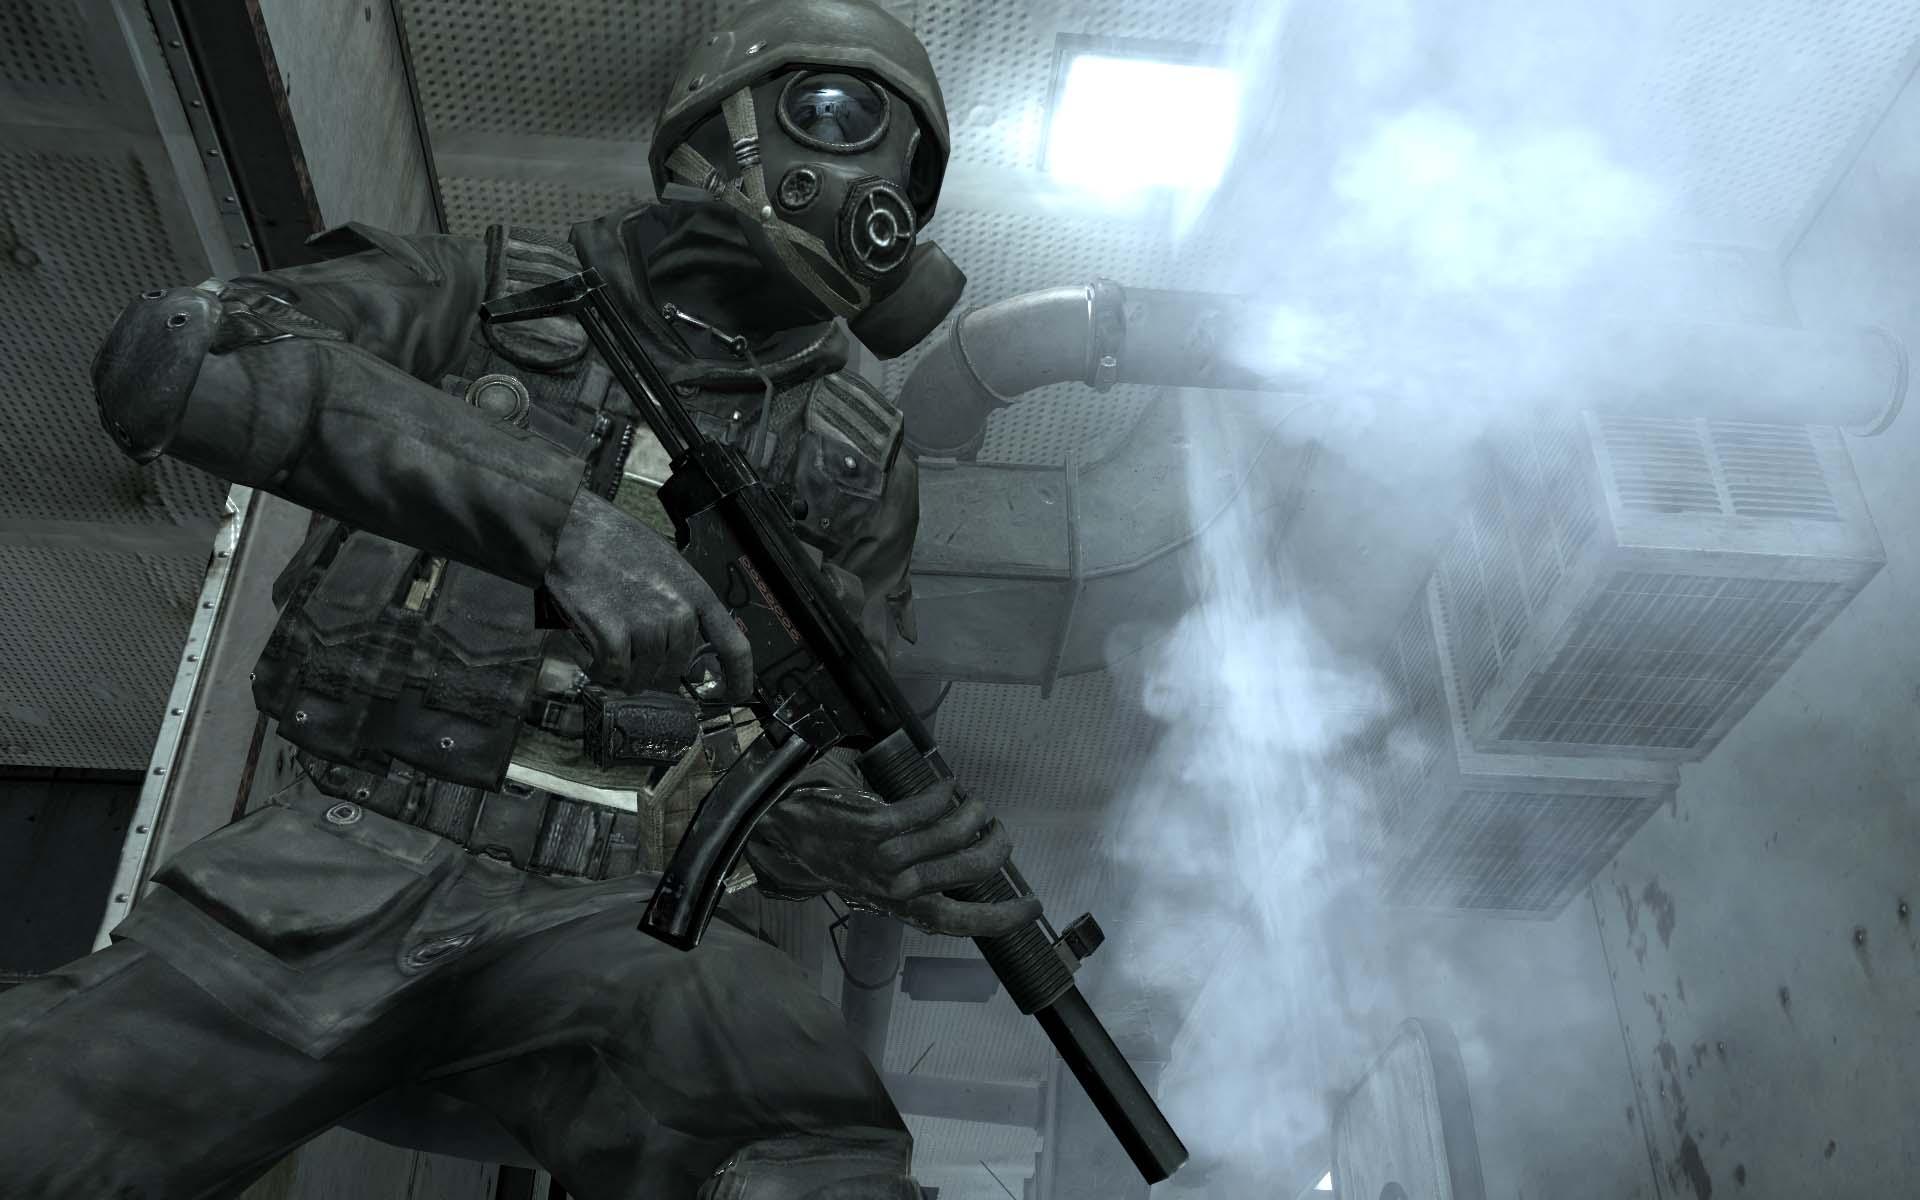 swat modern warfare sas or something cod call duty ps3 xbox game 1920x1200